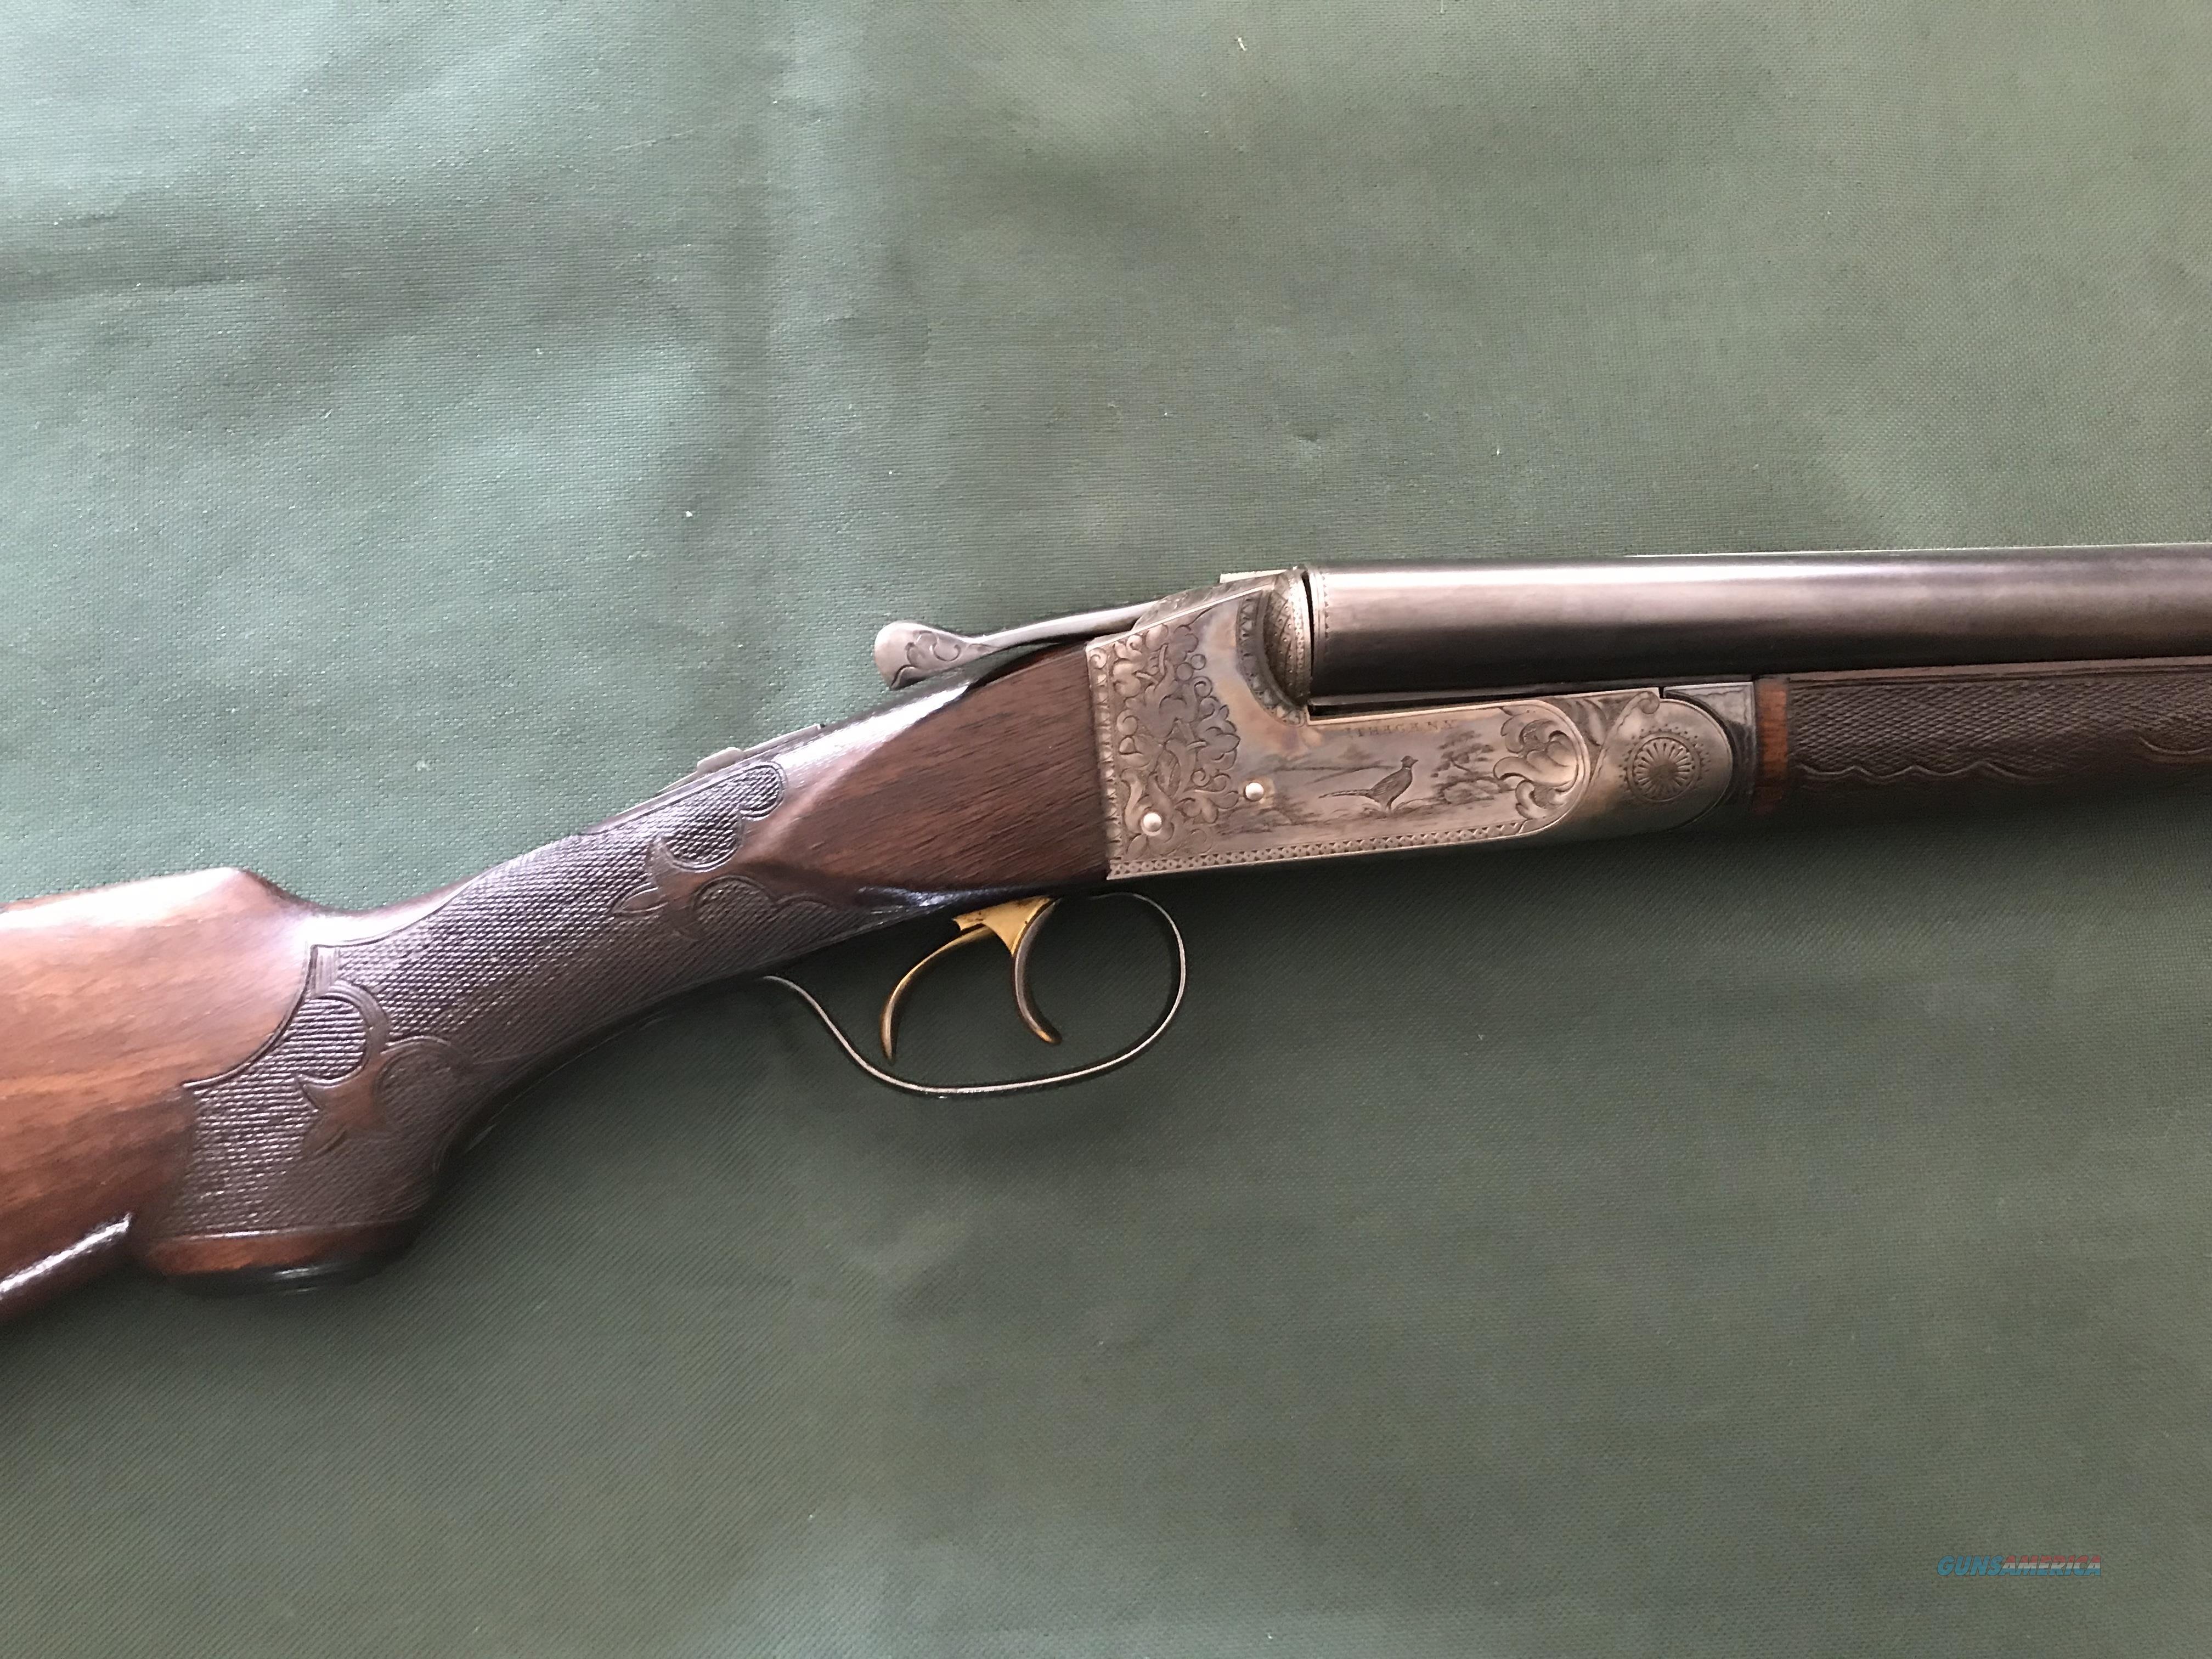 Ithaca Flues 4E 20 Ga. - Very High Condition  Guns > Shotguns > Ithaca Shotguns > SxS